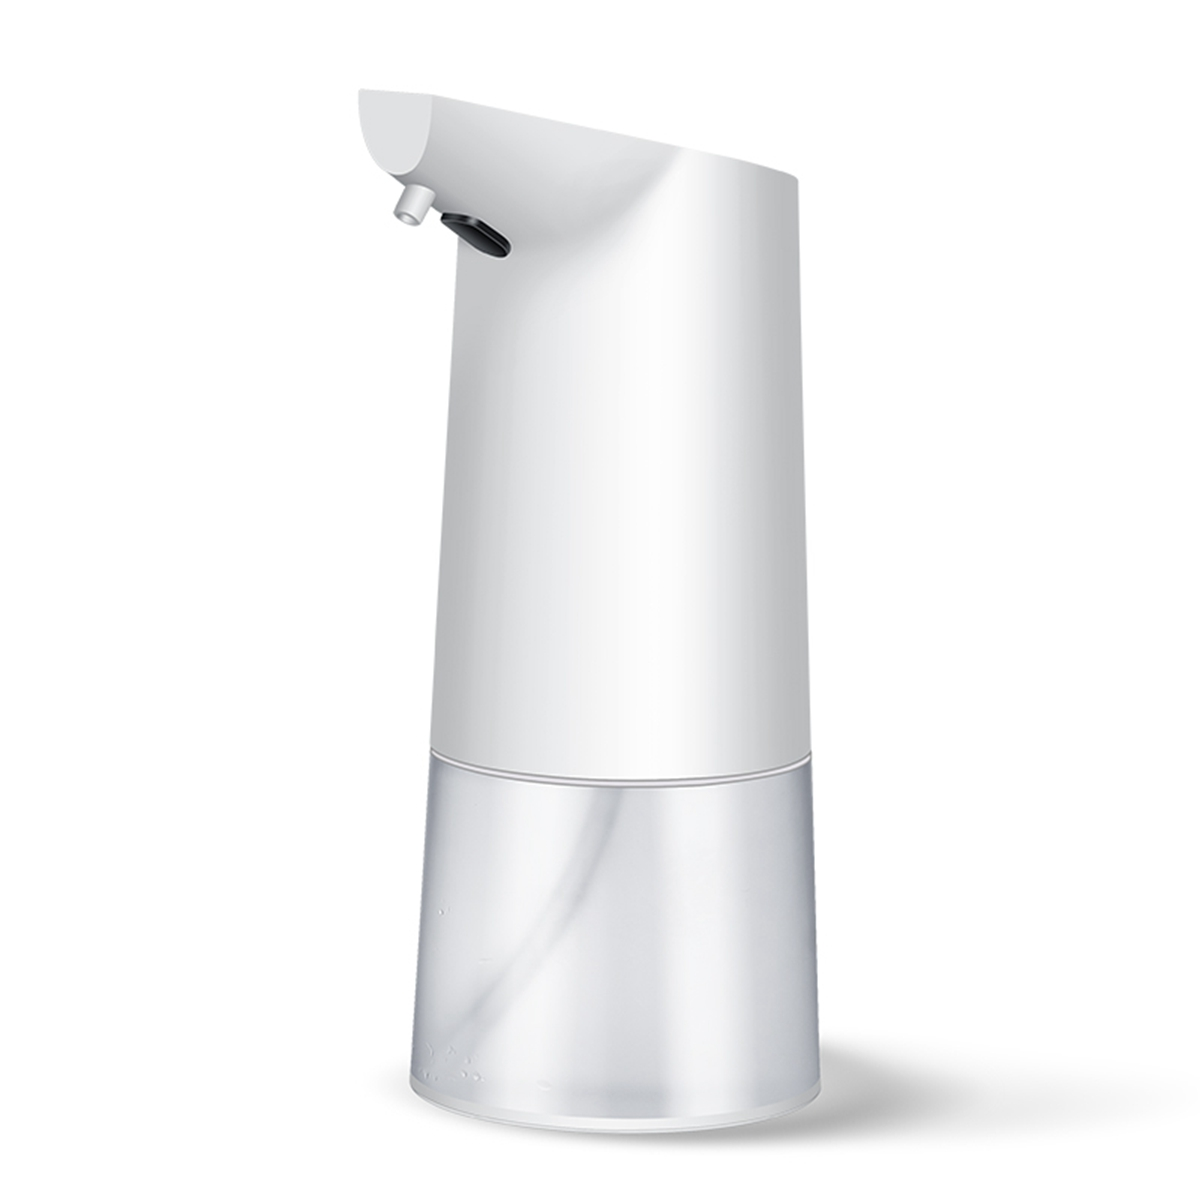 Image 4 - Xiaowei X4 Intelligent Soap Dispenser Automatic Induction Foaming Liquid Shampoo Container PIR Infrared Sensor Hand WashingLiquid Soap Dispensers   -